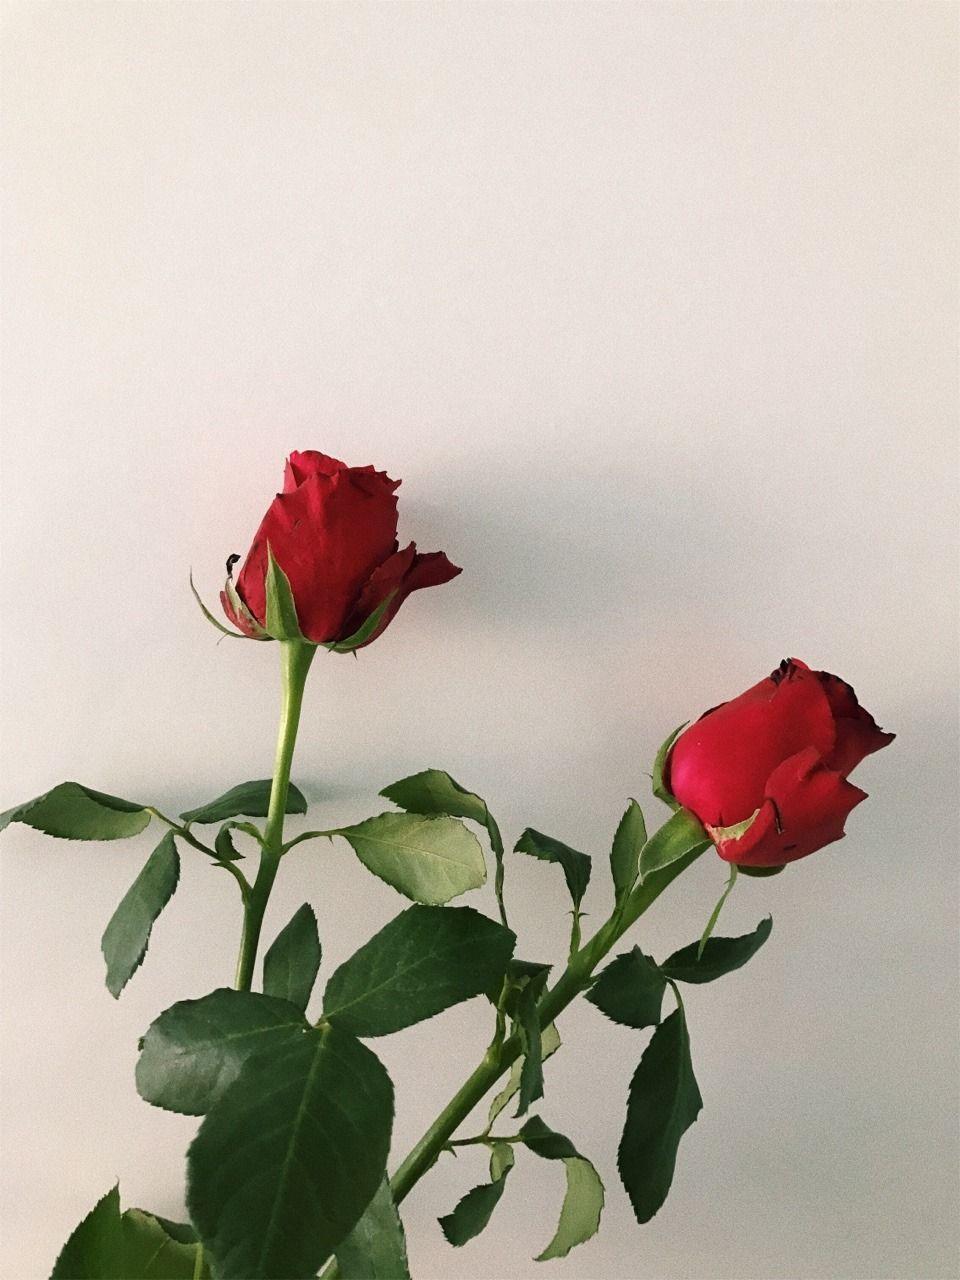 Aesthetic Rose Flowers Wallpapers , Top Free Aesthetic Rose